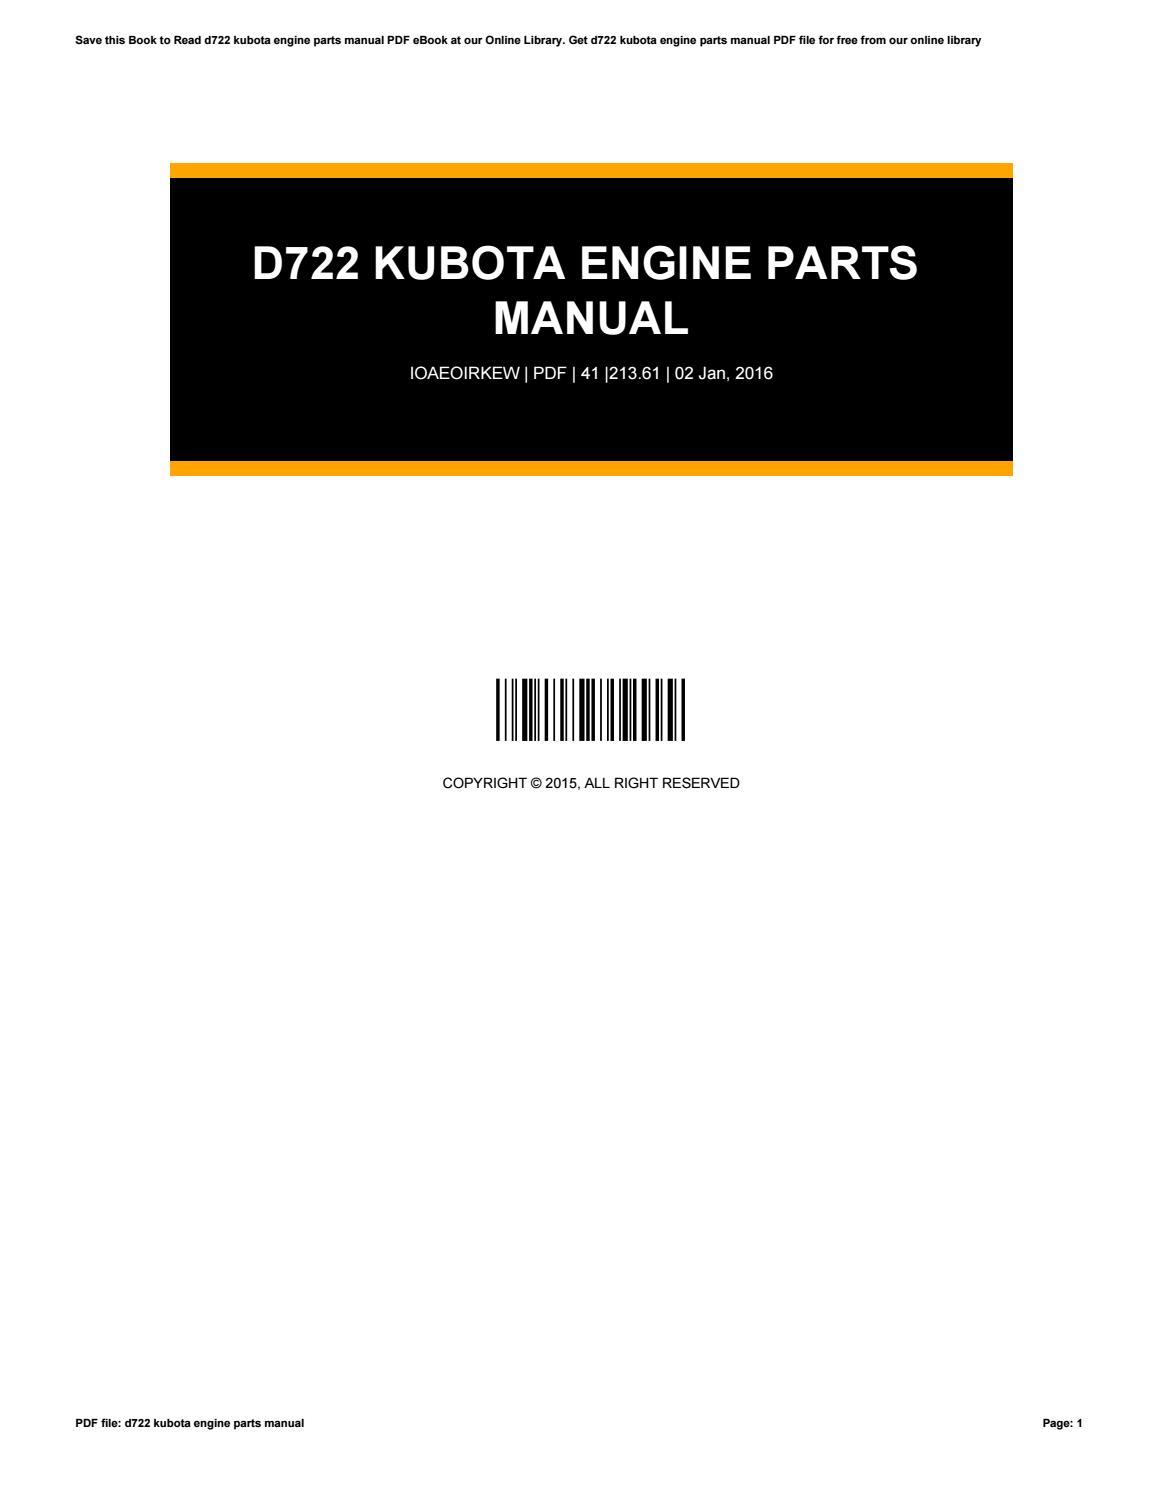 D722 Kubota Engine Manual